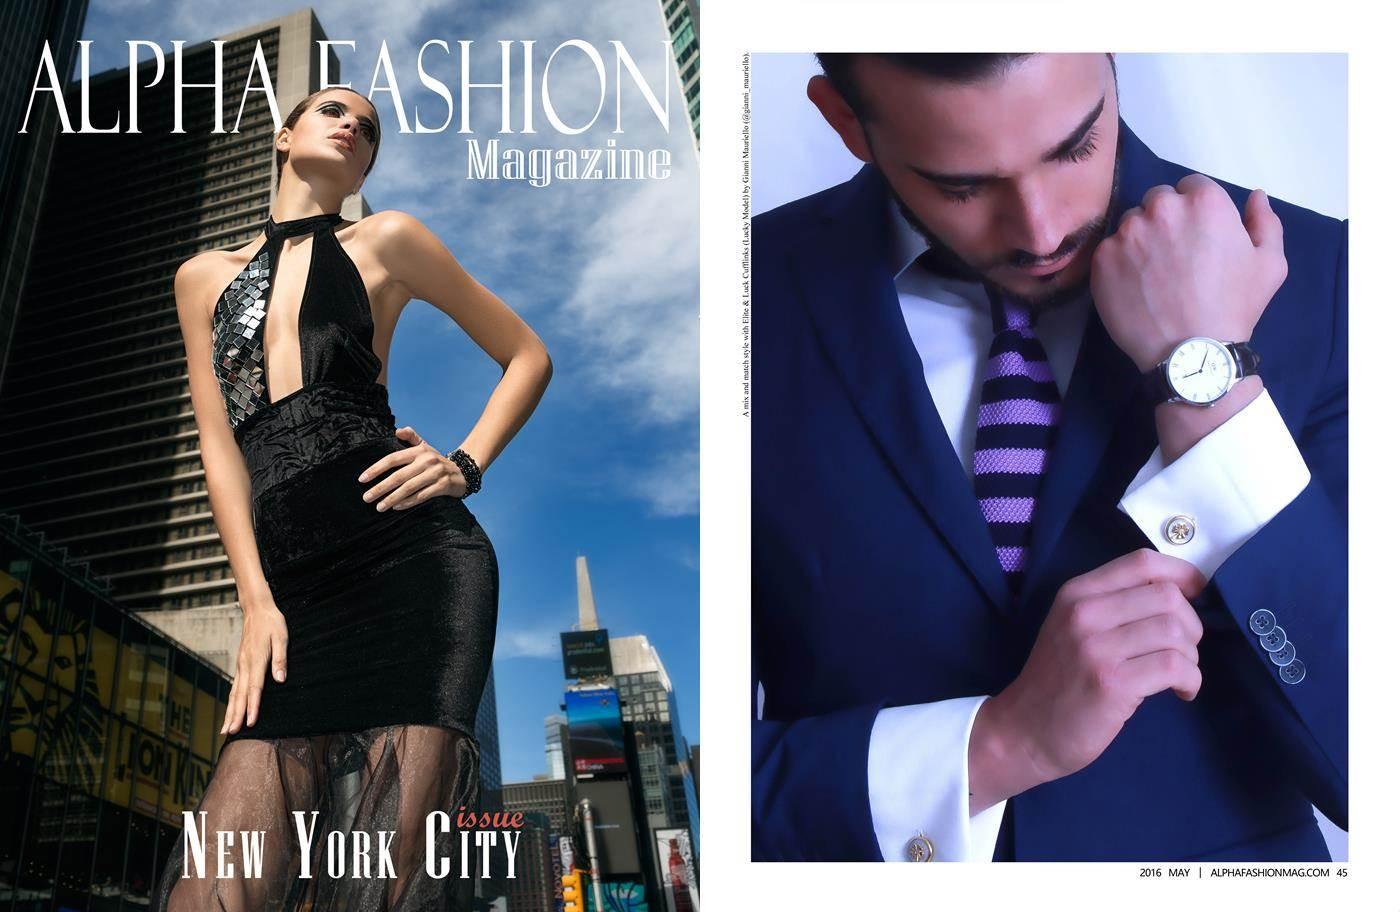 Elite & Luck Cufflinks ในนิตยสาร Alpha Fashion Magazine (New York City Issue) ฉบับเดือนพฤษภาคม 2016.